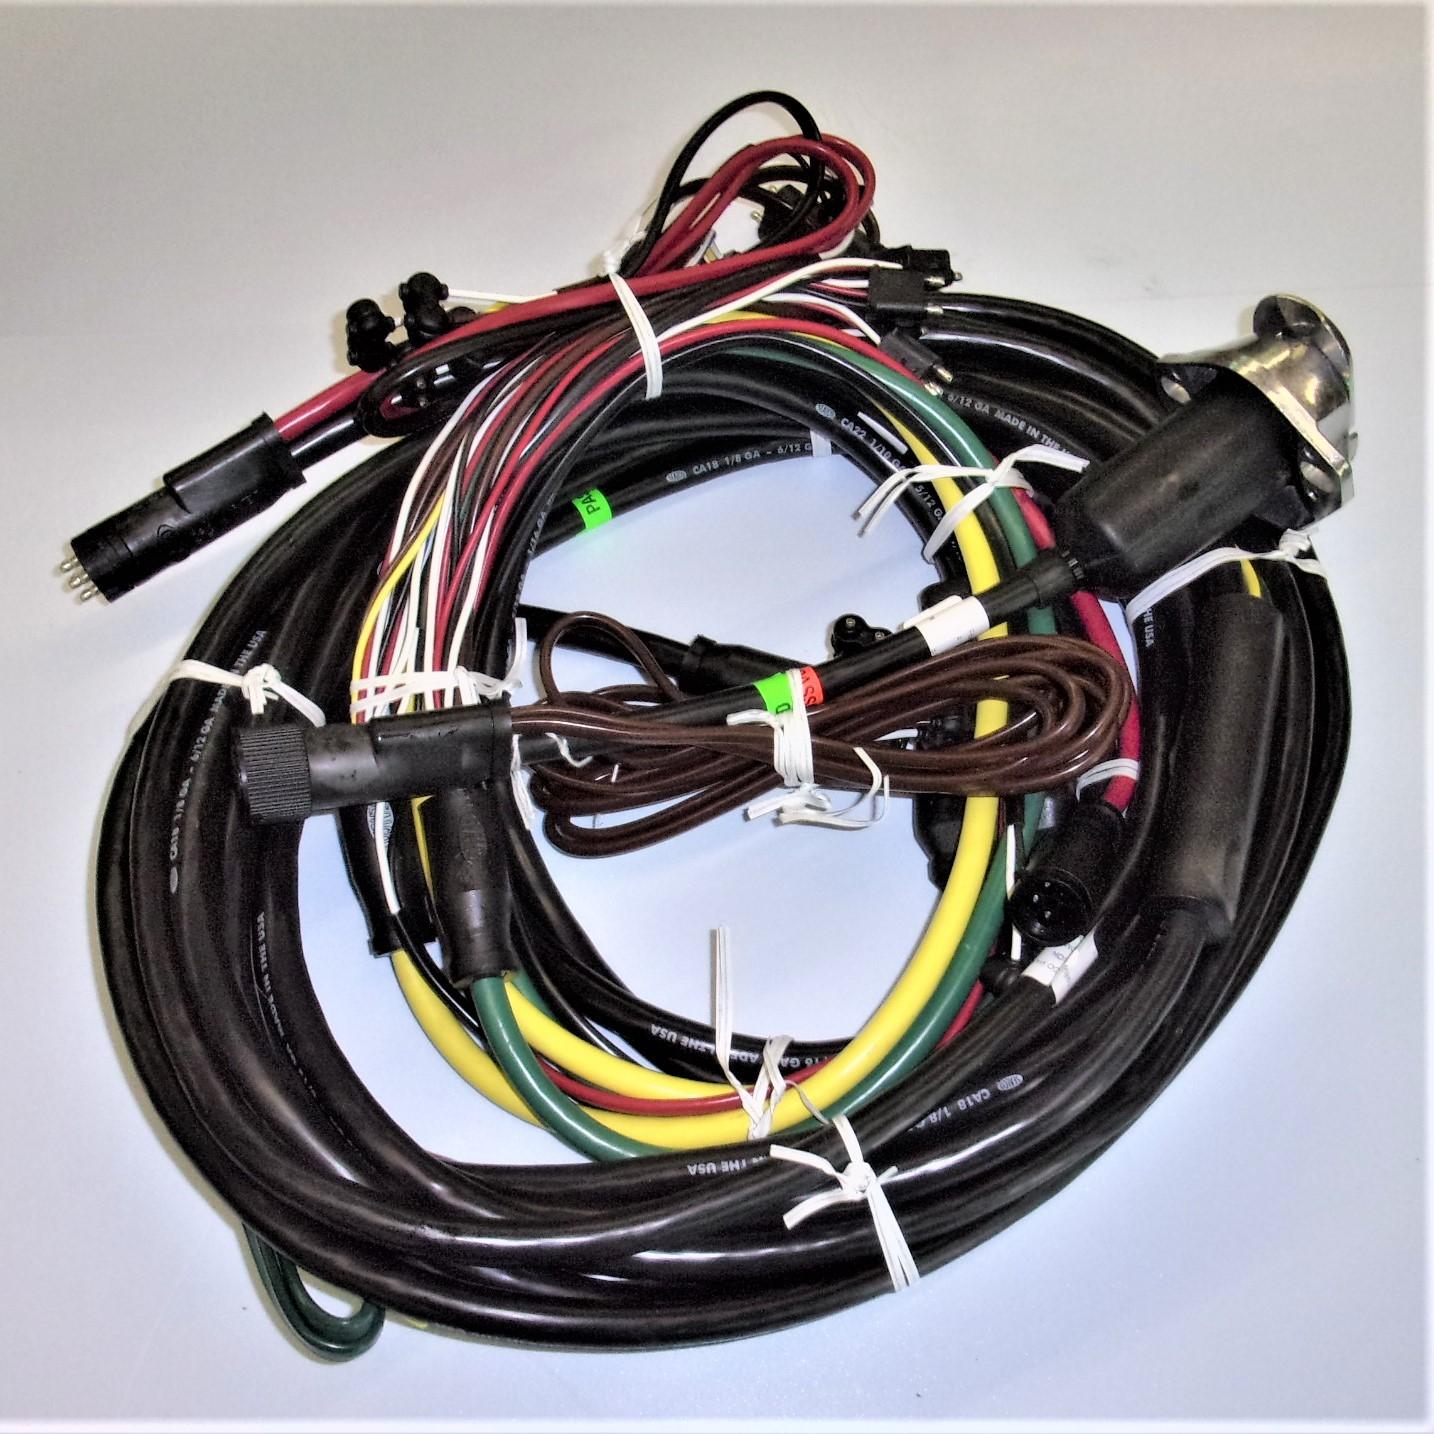 Universal 48 Trailer Wiring Harness Kit